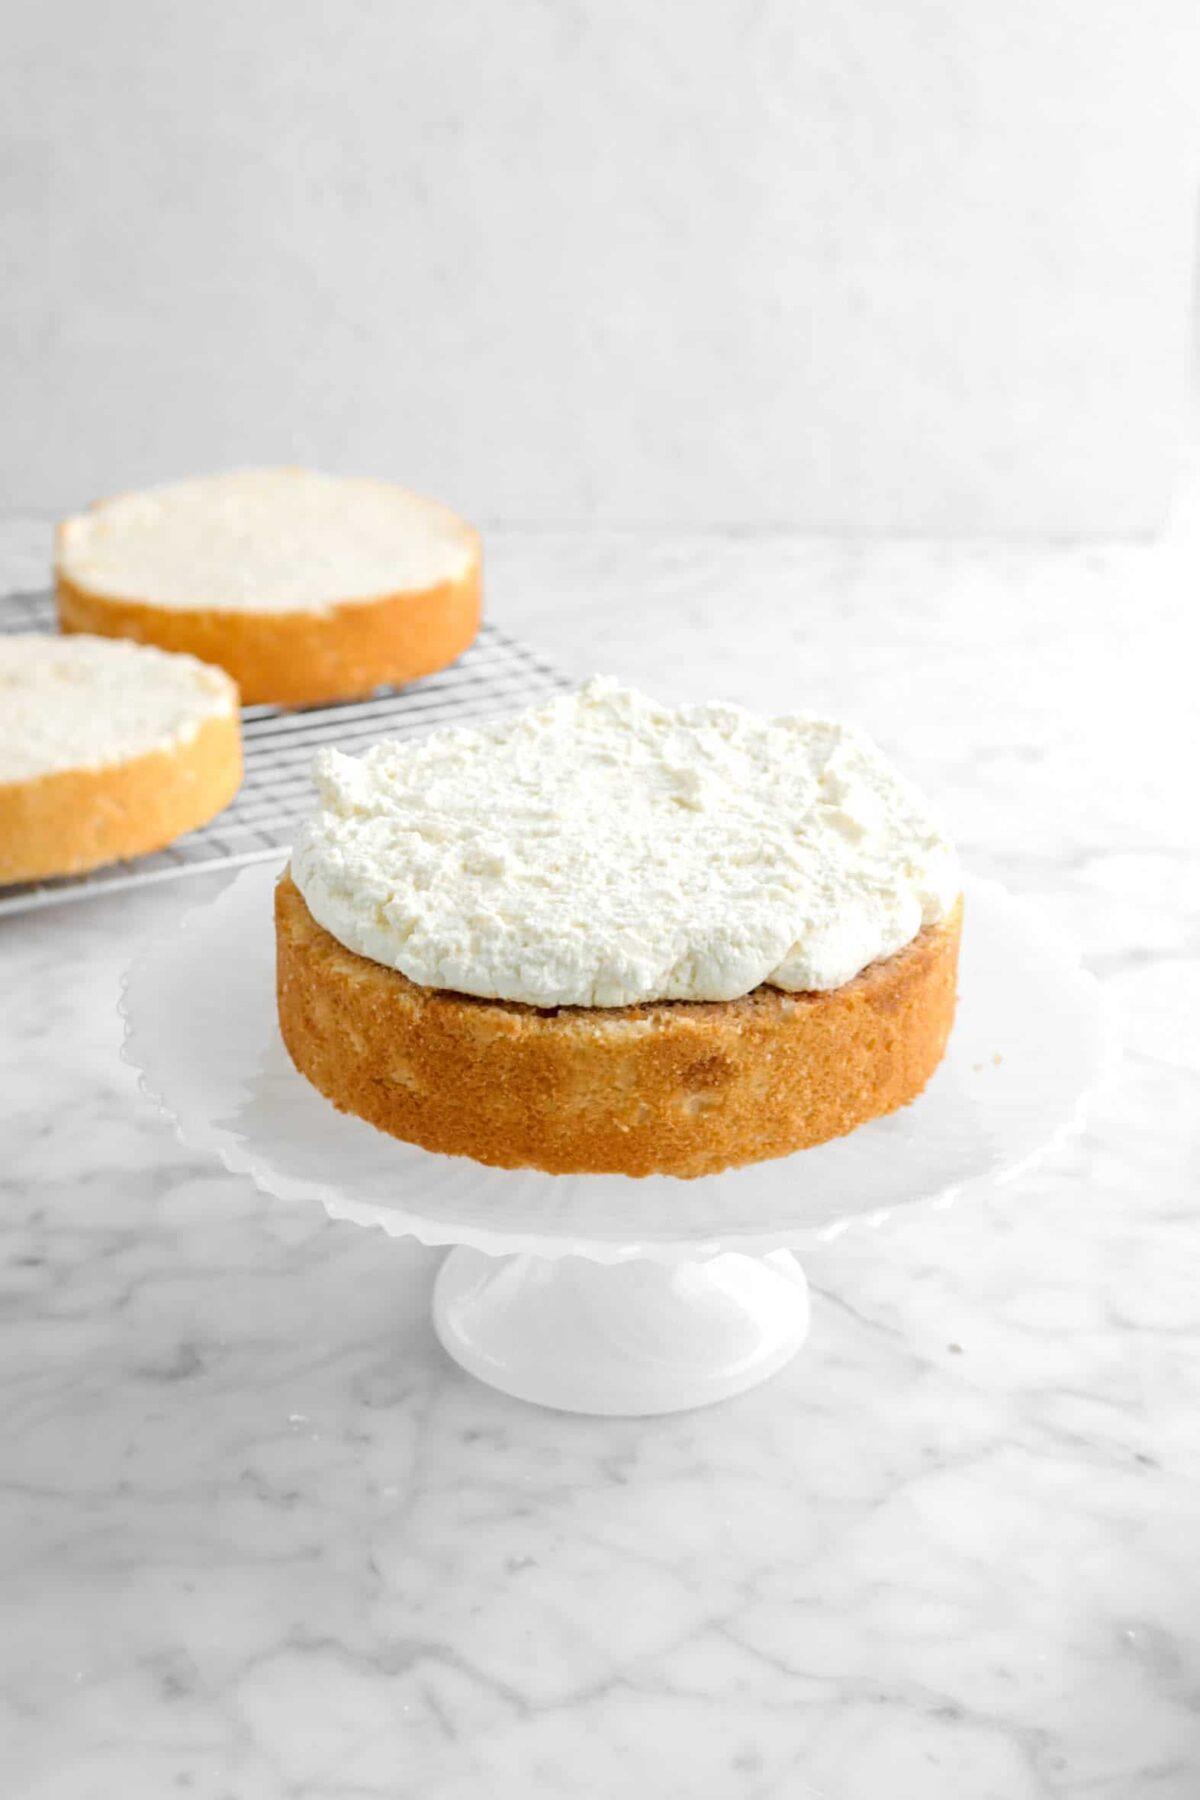 tiramisu filling added on top of cake layer